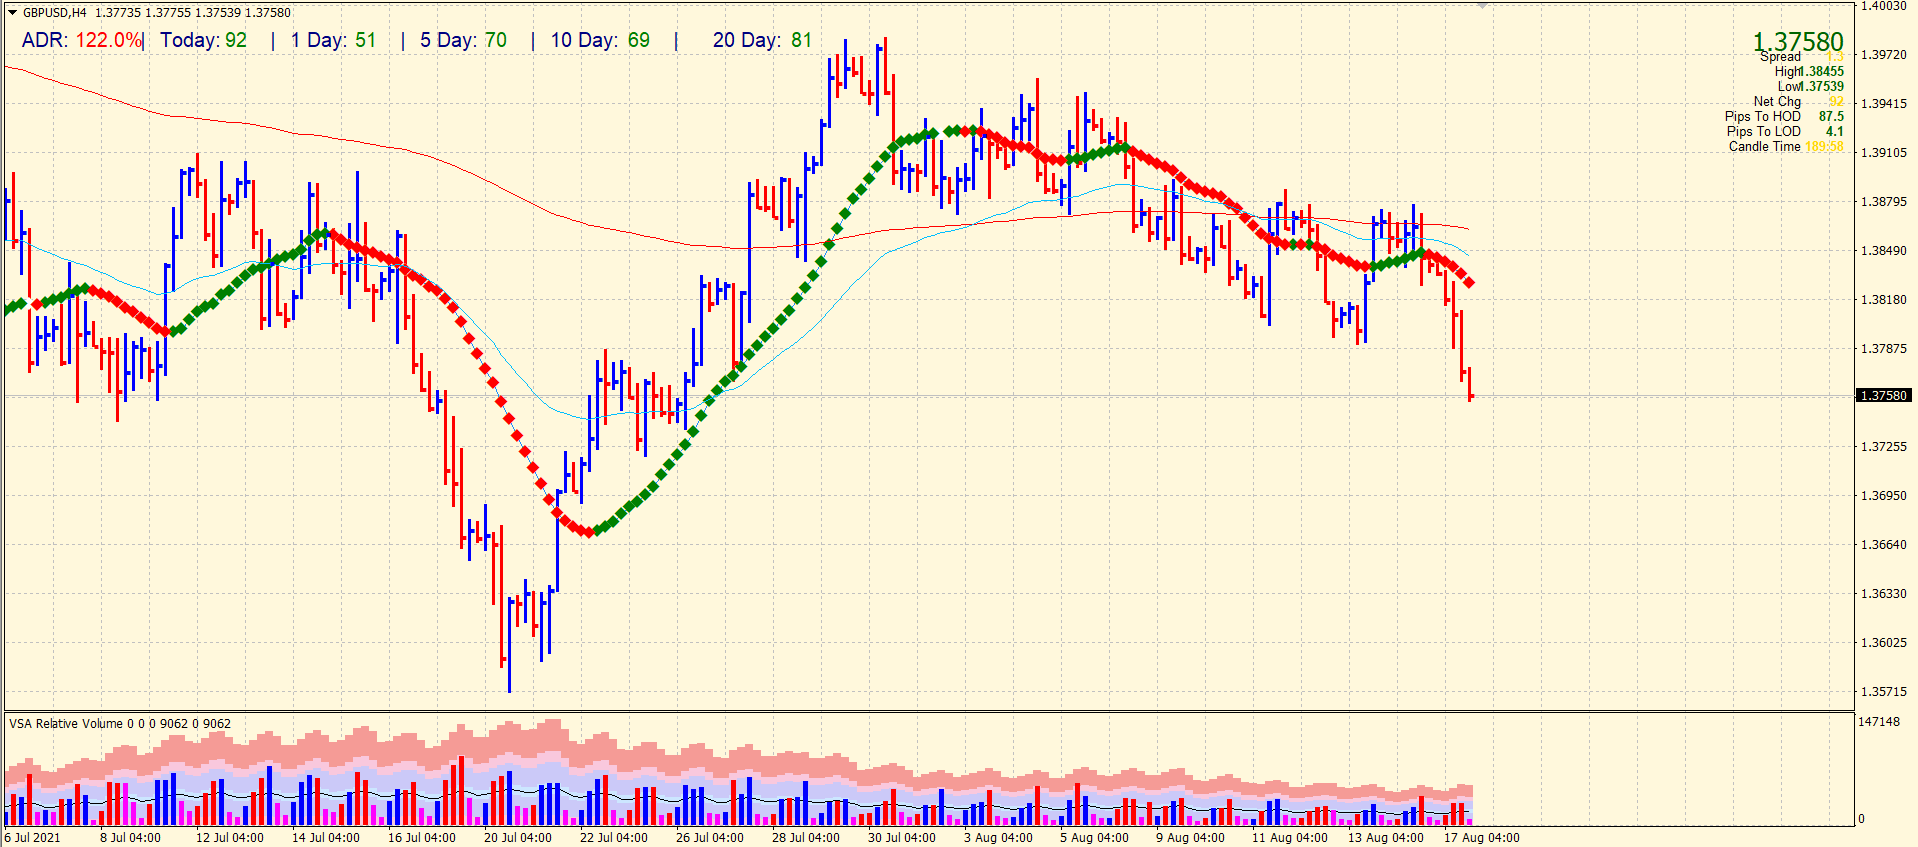 GBP/USD 4-hour chart analysis